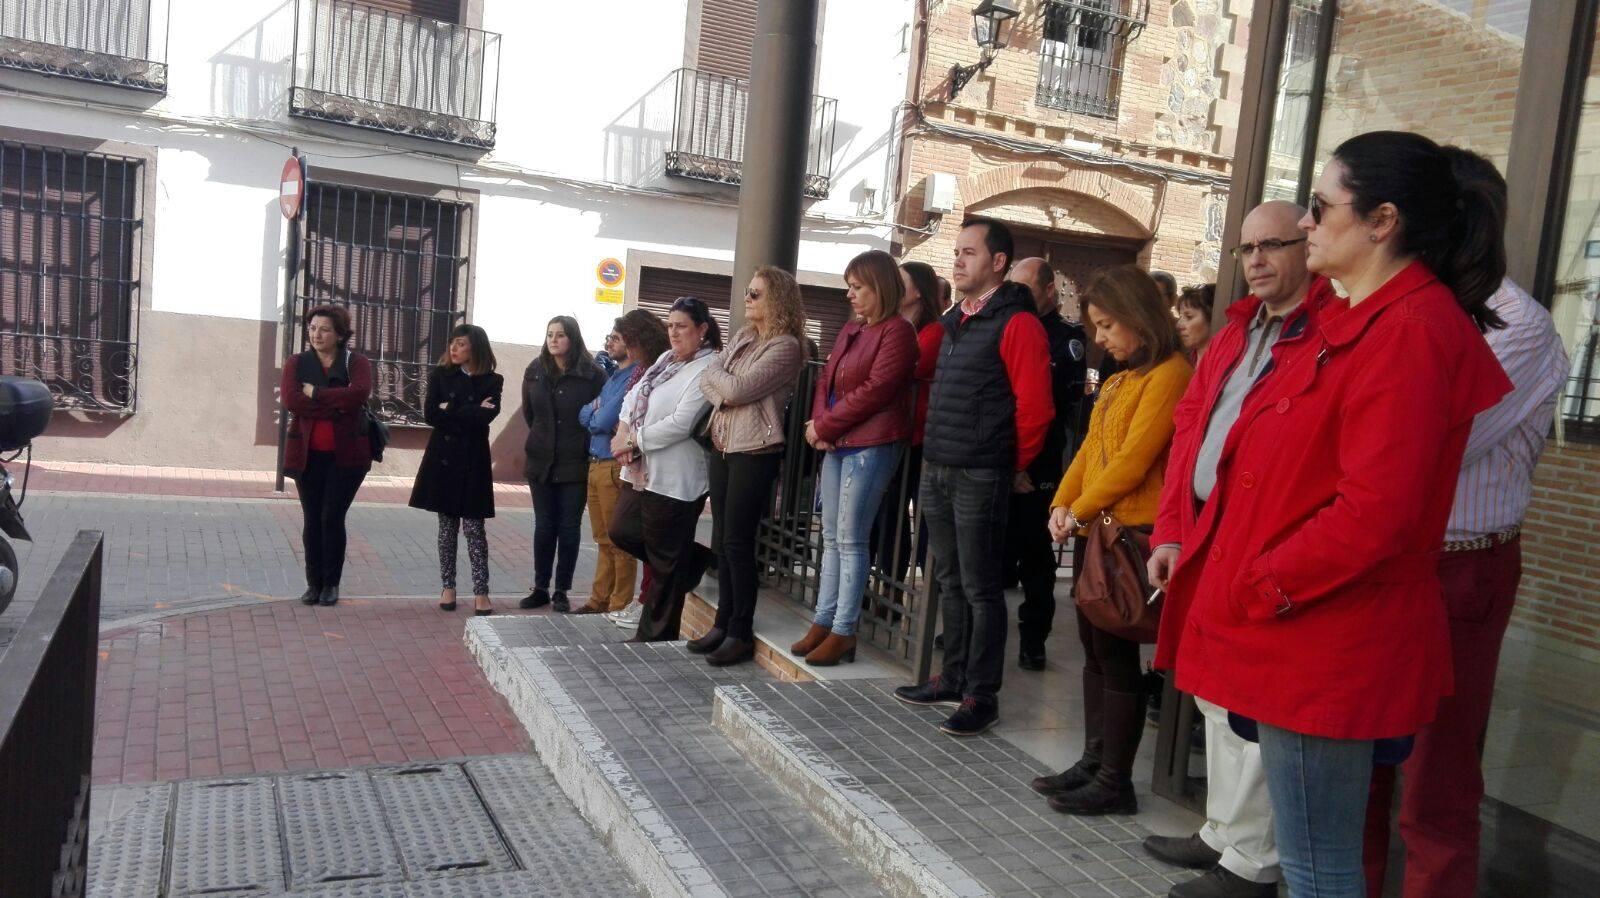 Silencio en Herencia contra la violencia de género en apoyo a Campo de Criptana 6